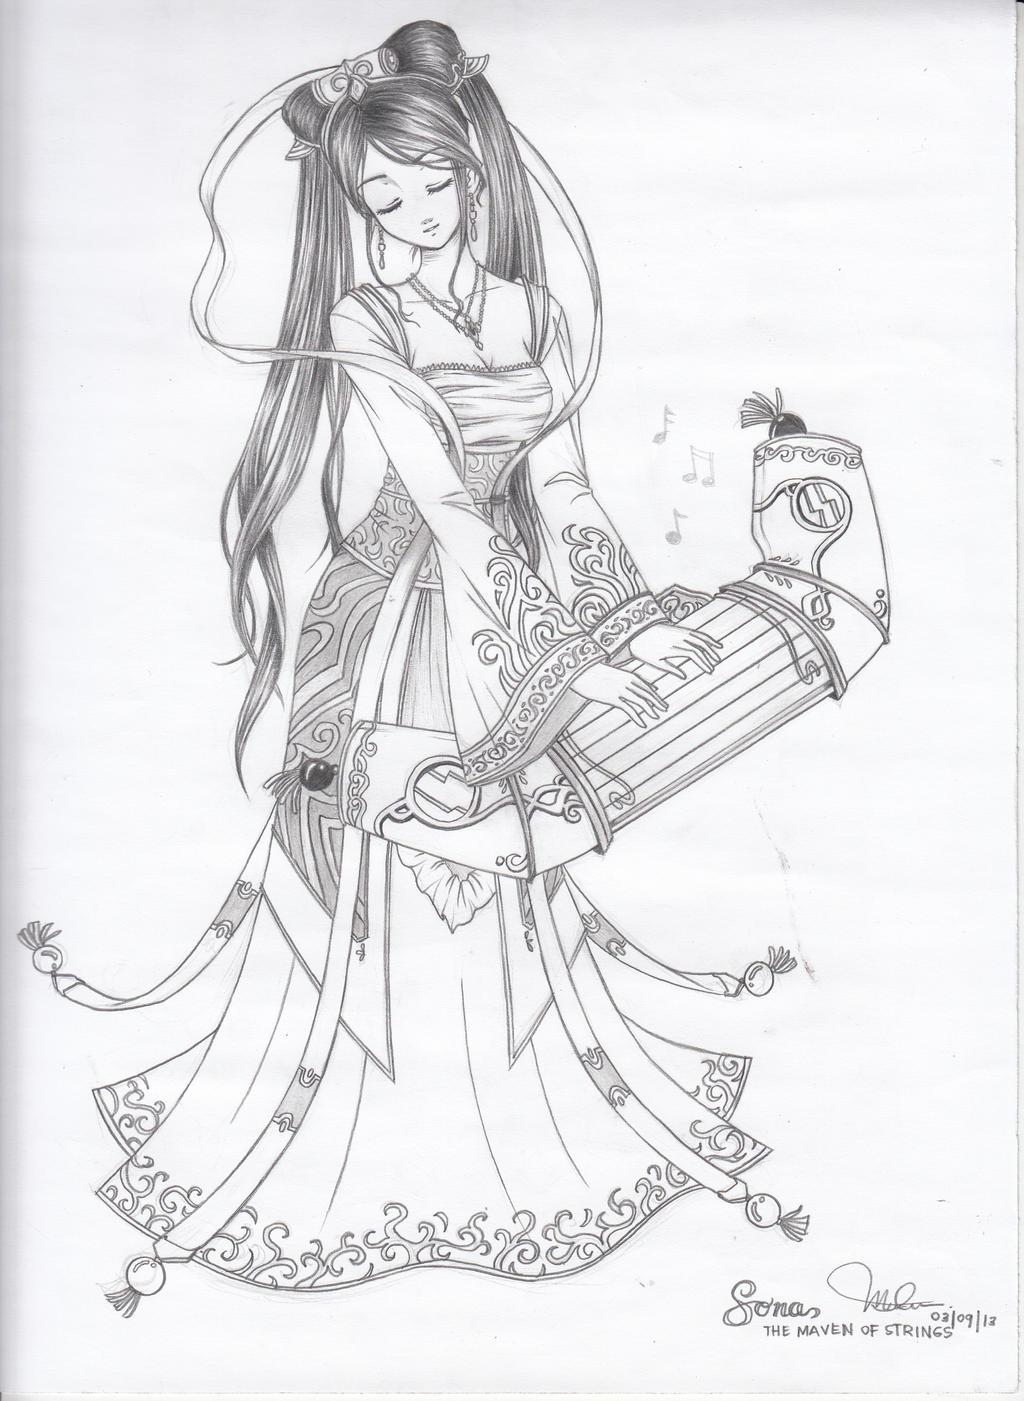 Sona, Maven of the Strings by avlem0126